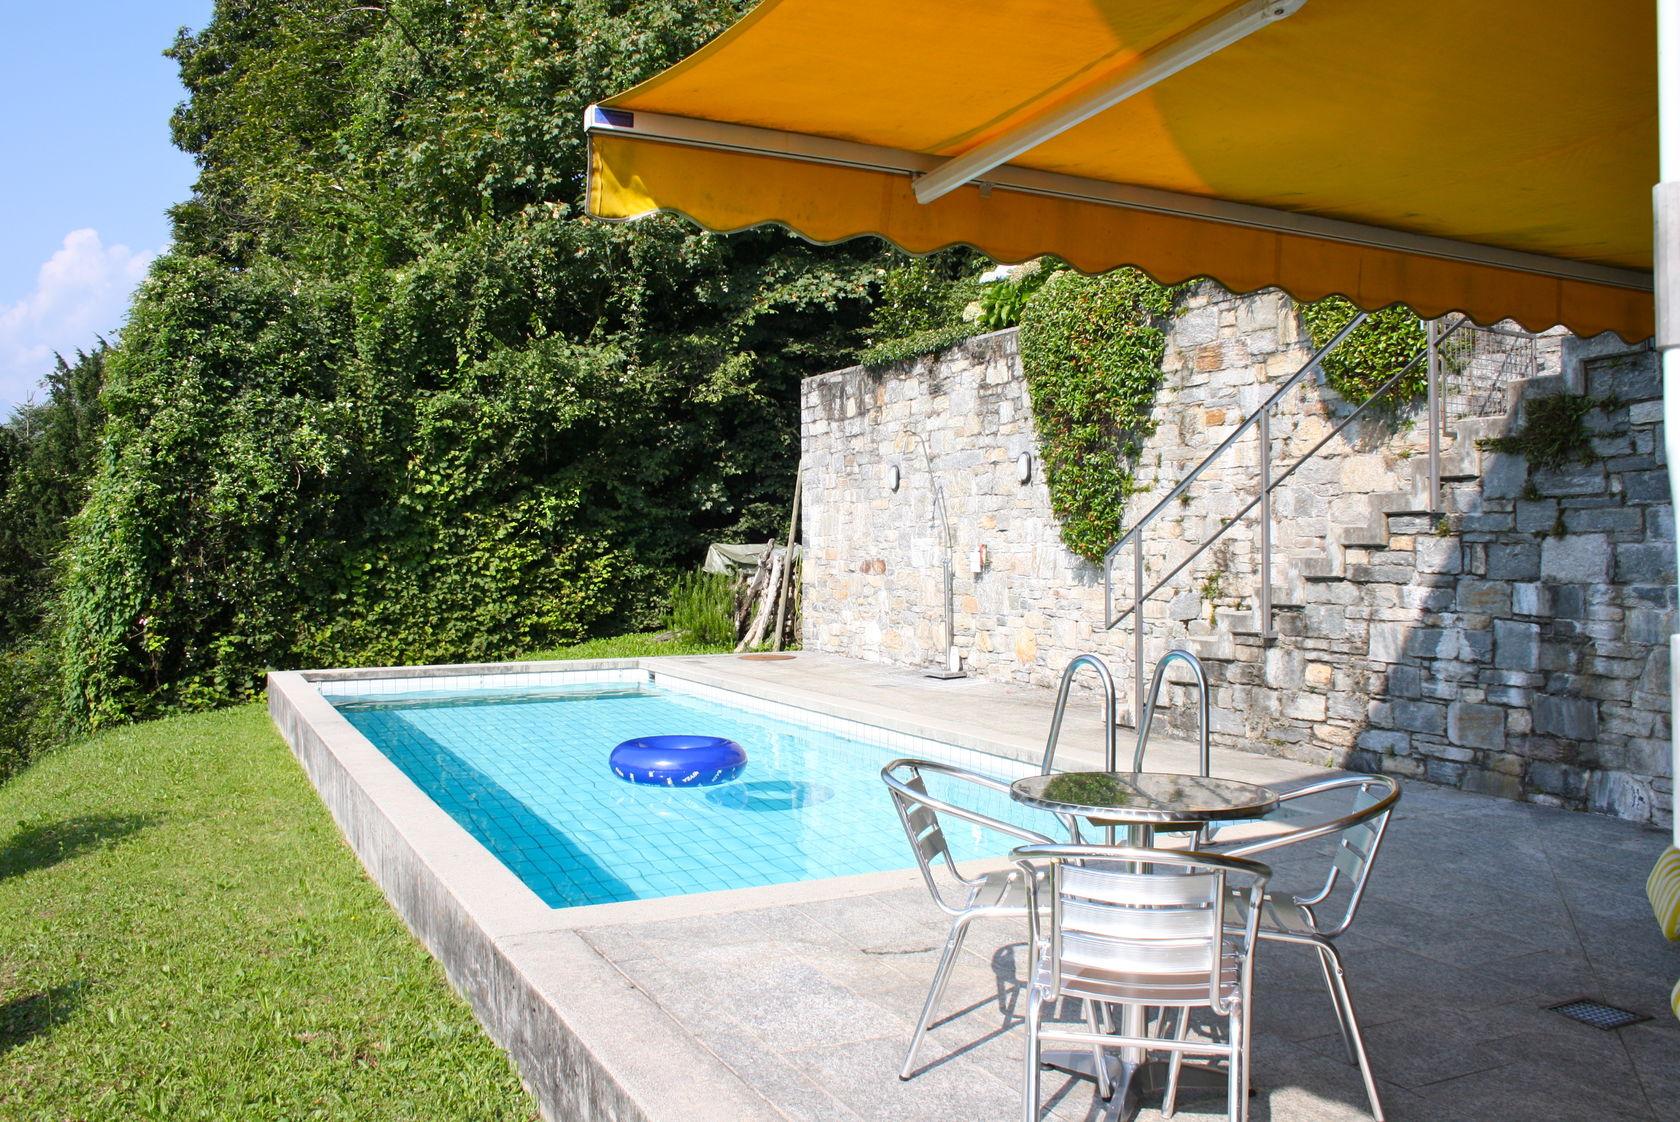 fotogalerie von villa amici in contra mit pool seesicht. Black Bedroom Furniture Sets. Home Design Ideas